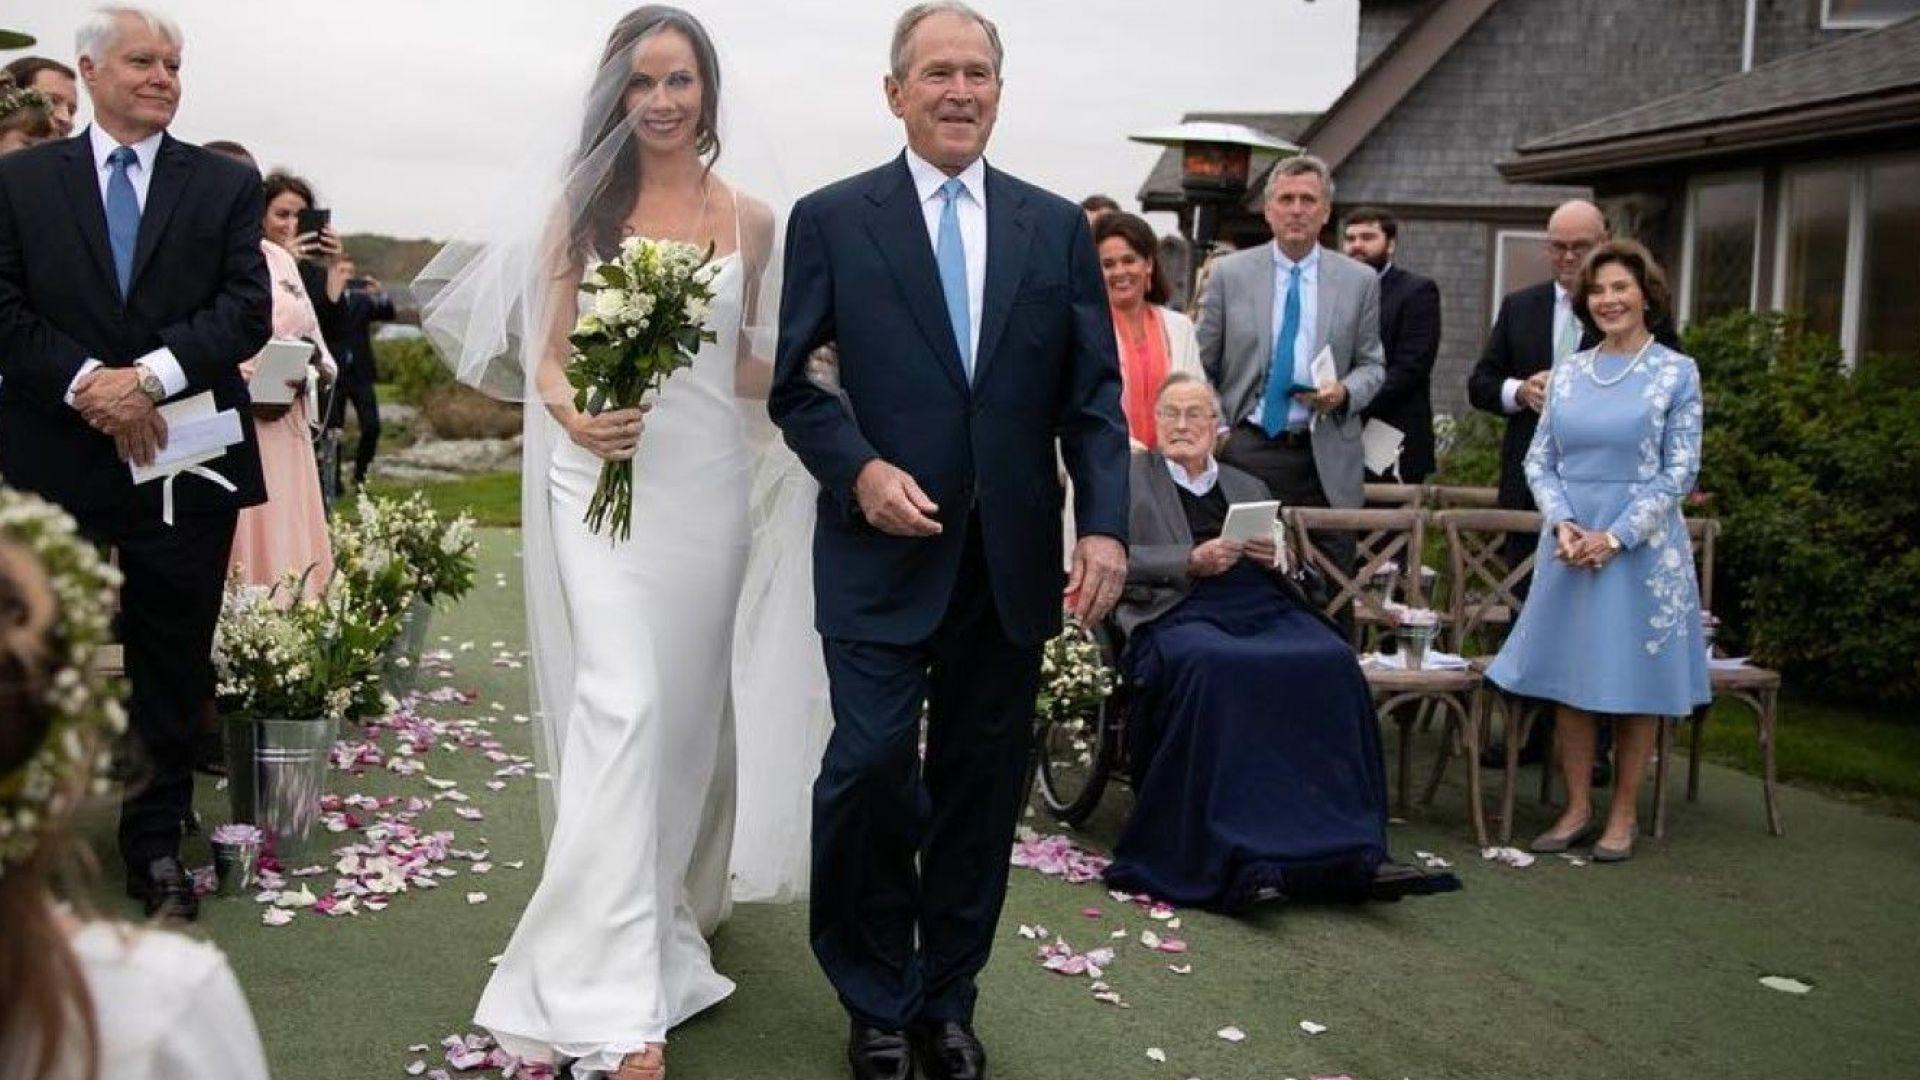 Джордж Буш омъжи дъщеря си за сценарист (снимки)